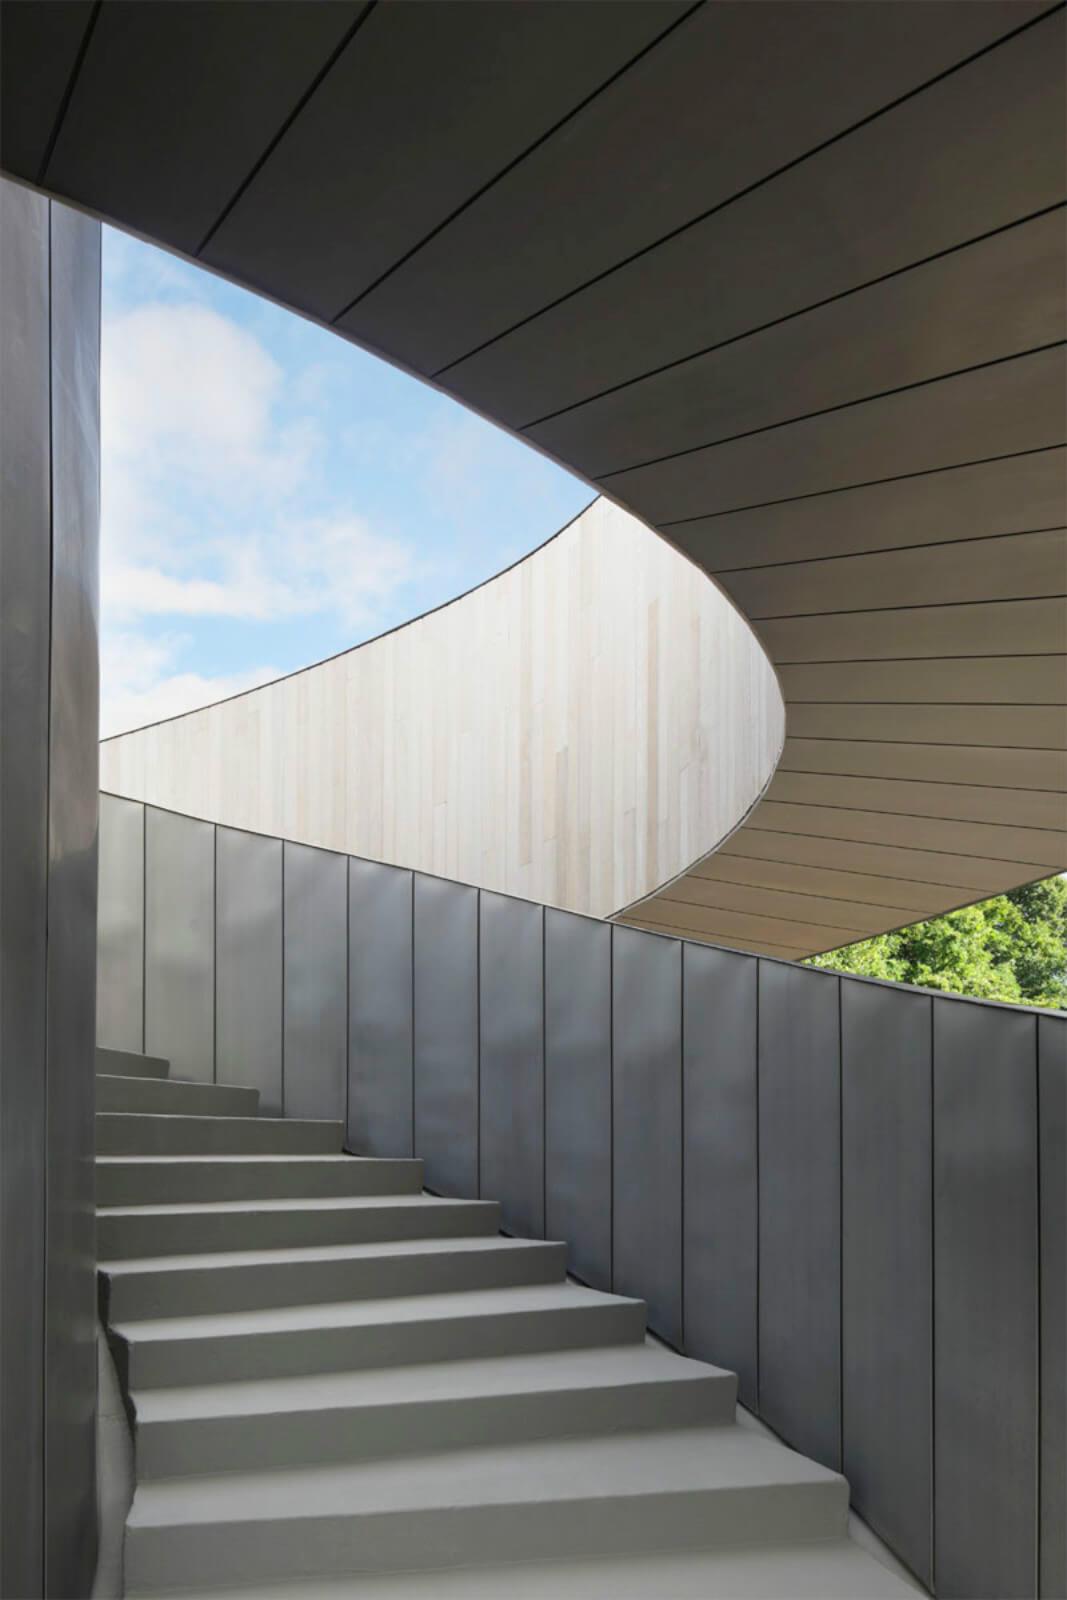 Arch2O-HiroshiNakamura-RibbonChapel-06